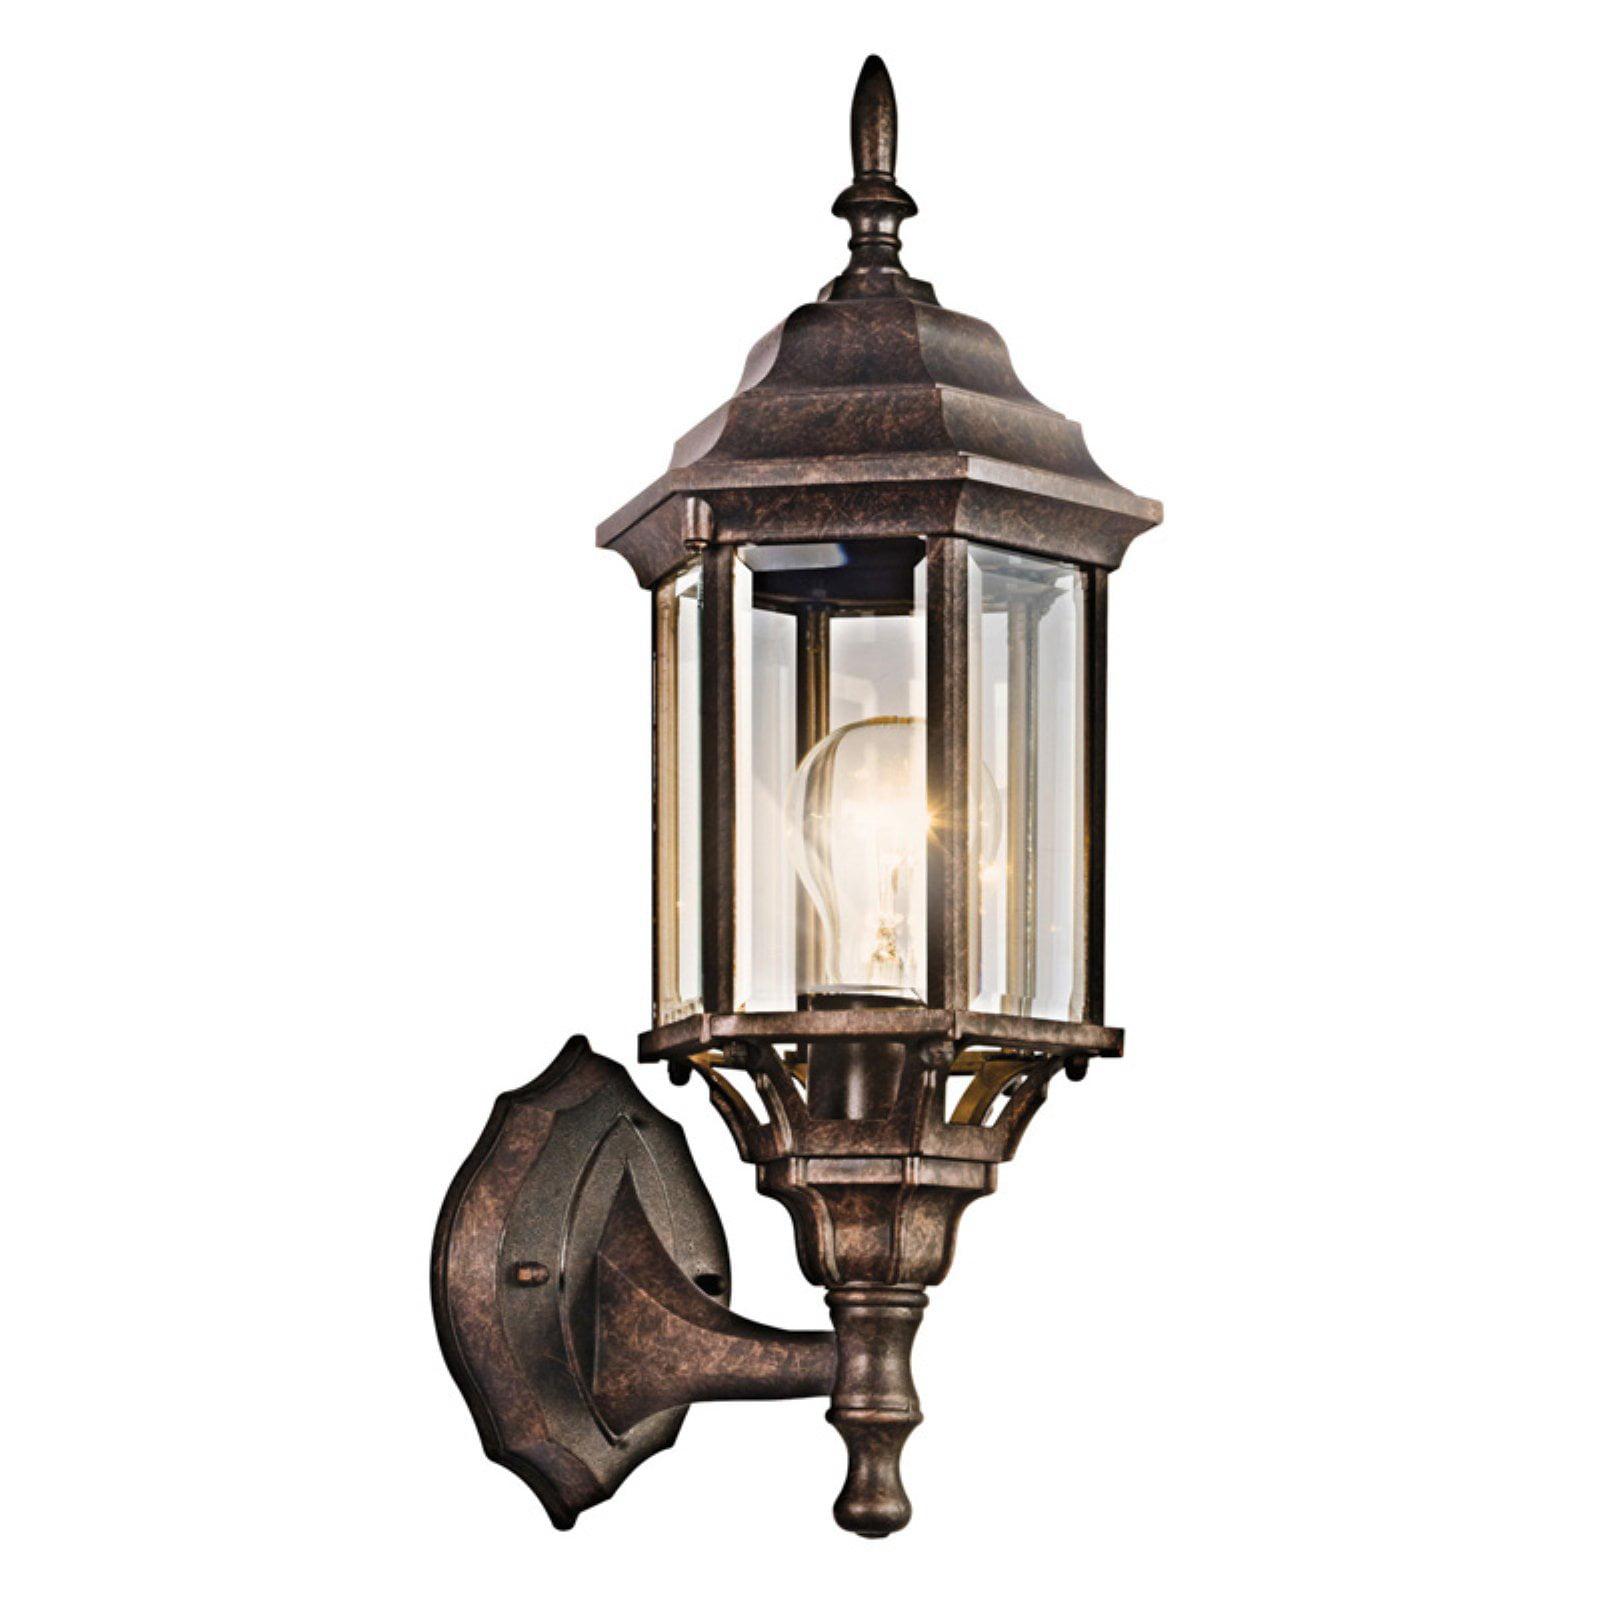 Kichler Chesapeake 49255 Outdoor Wall Lantern